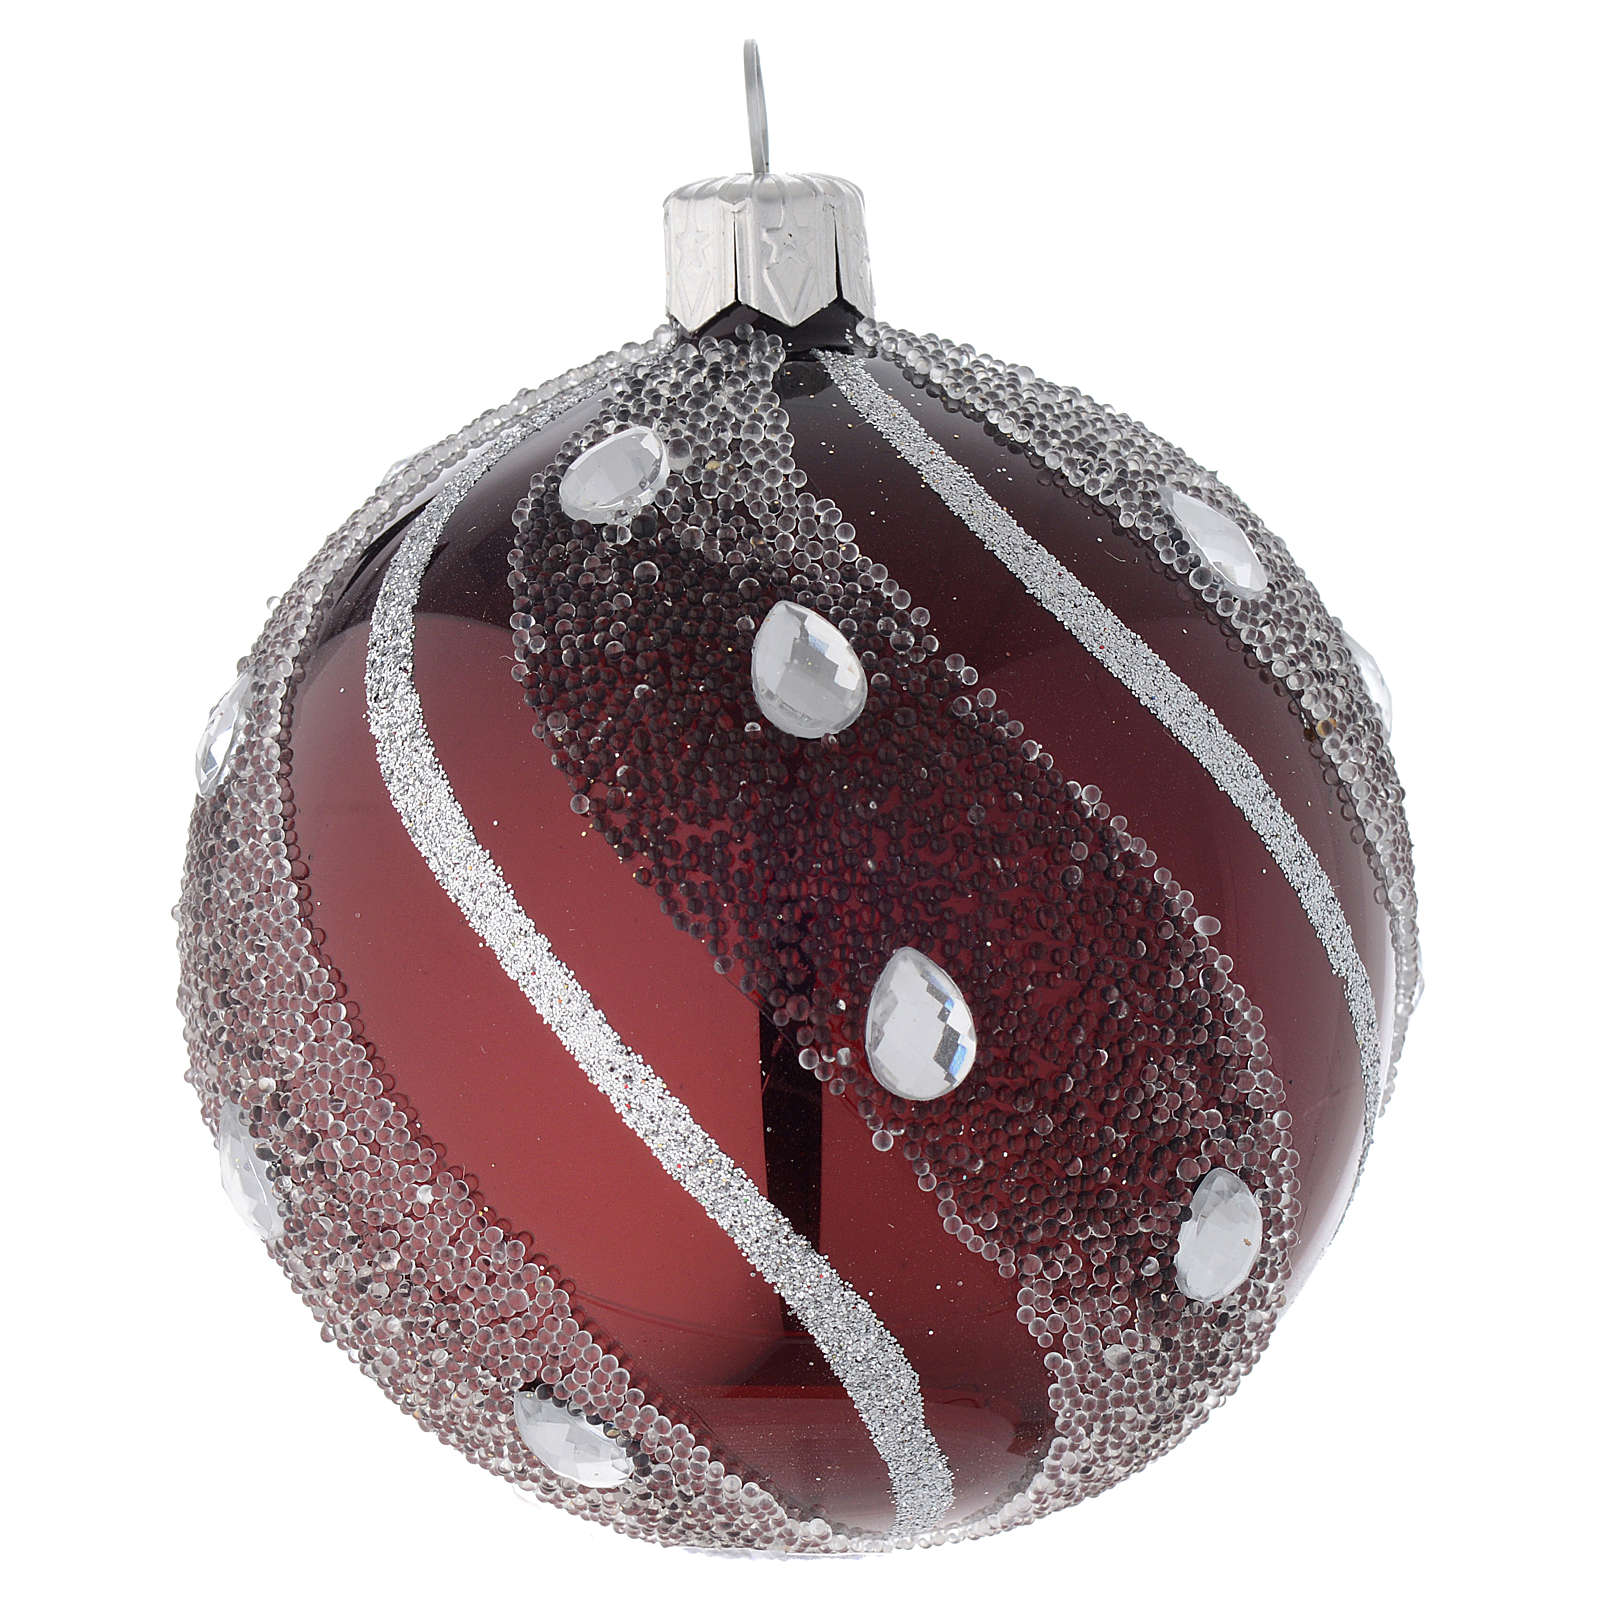 Pallina Natale in vetro bordeaux/argento 80 mm 4